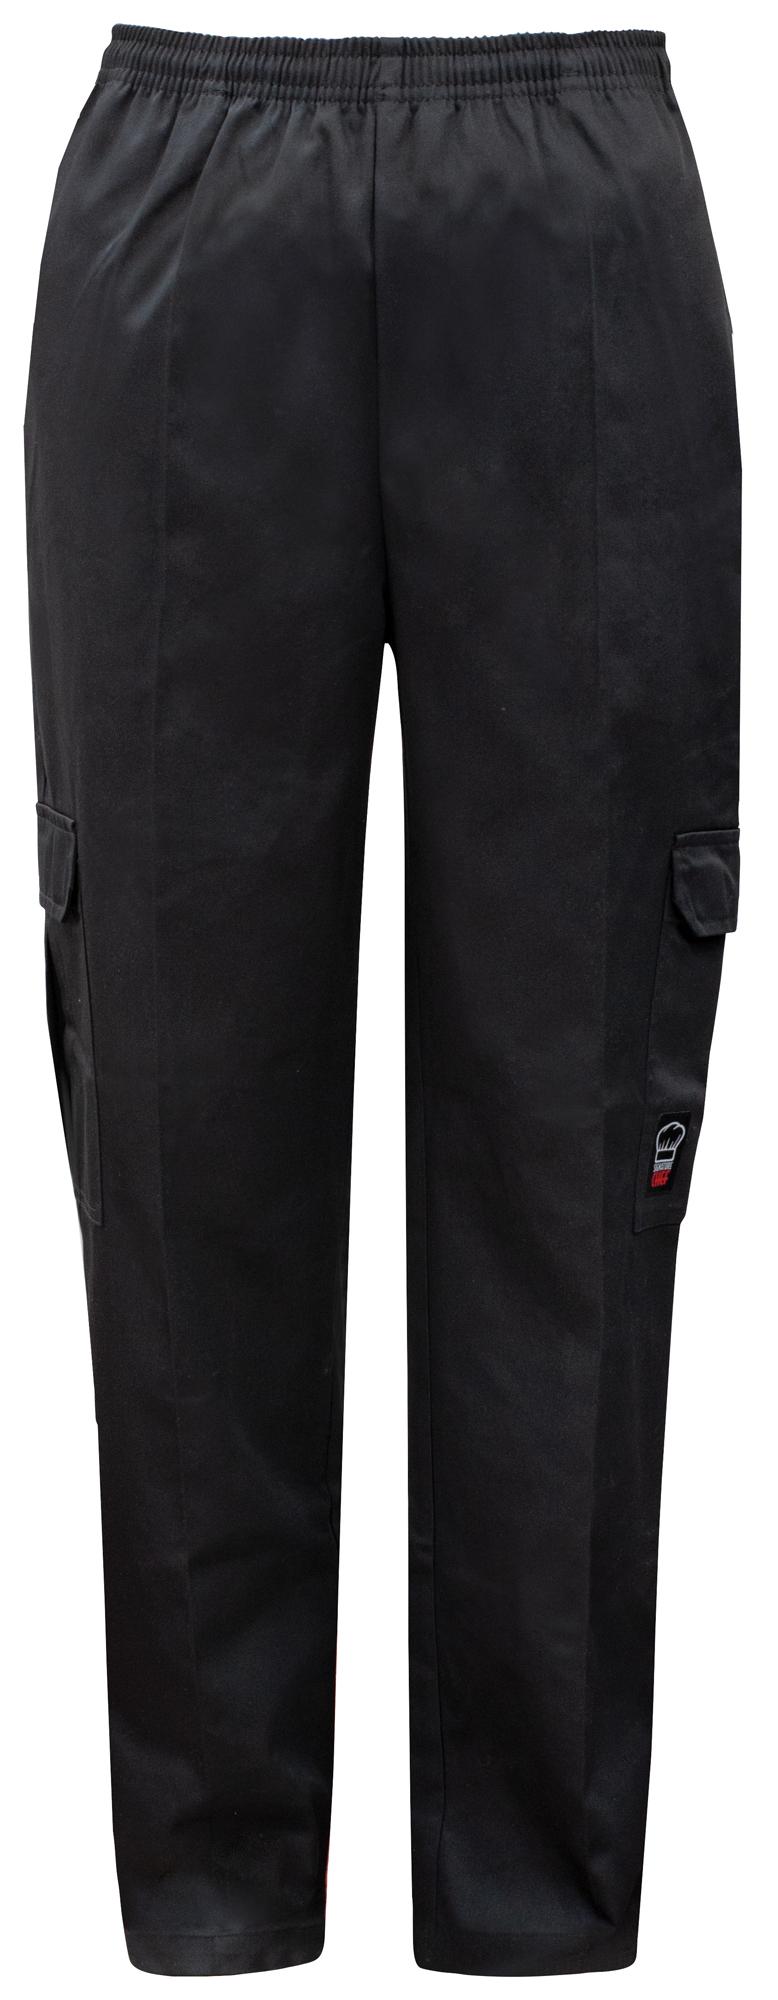 Winco UNF-11KXL cargo chef pants